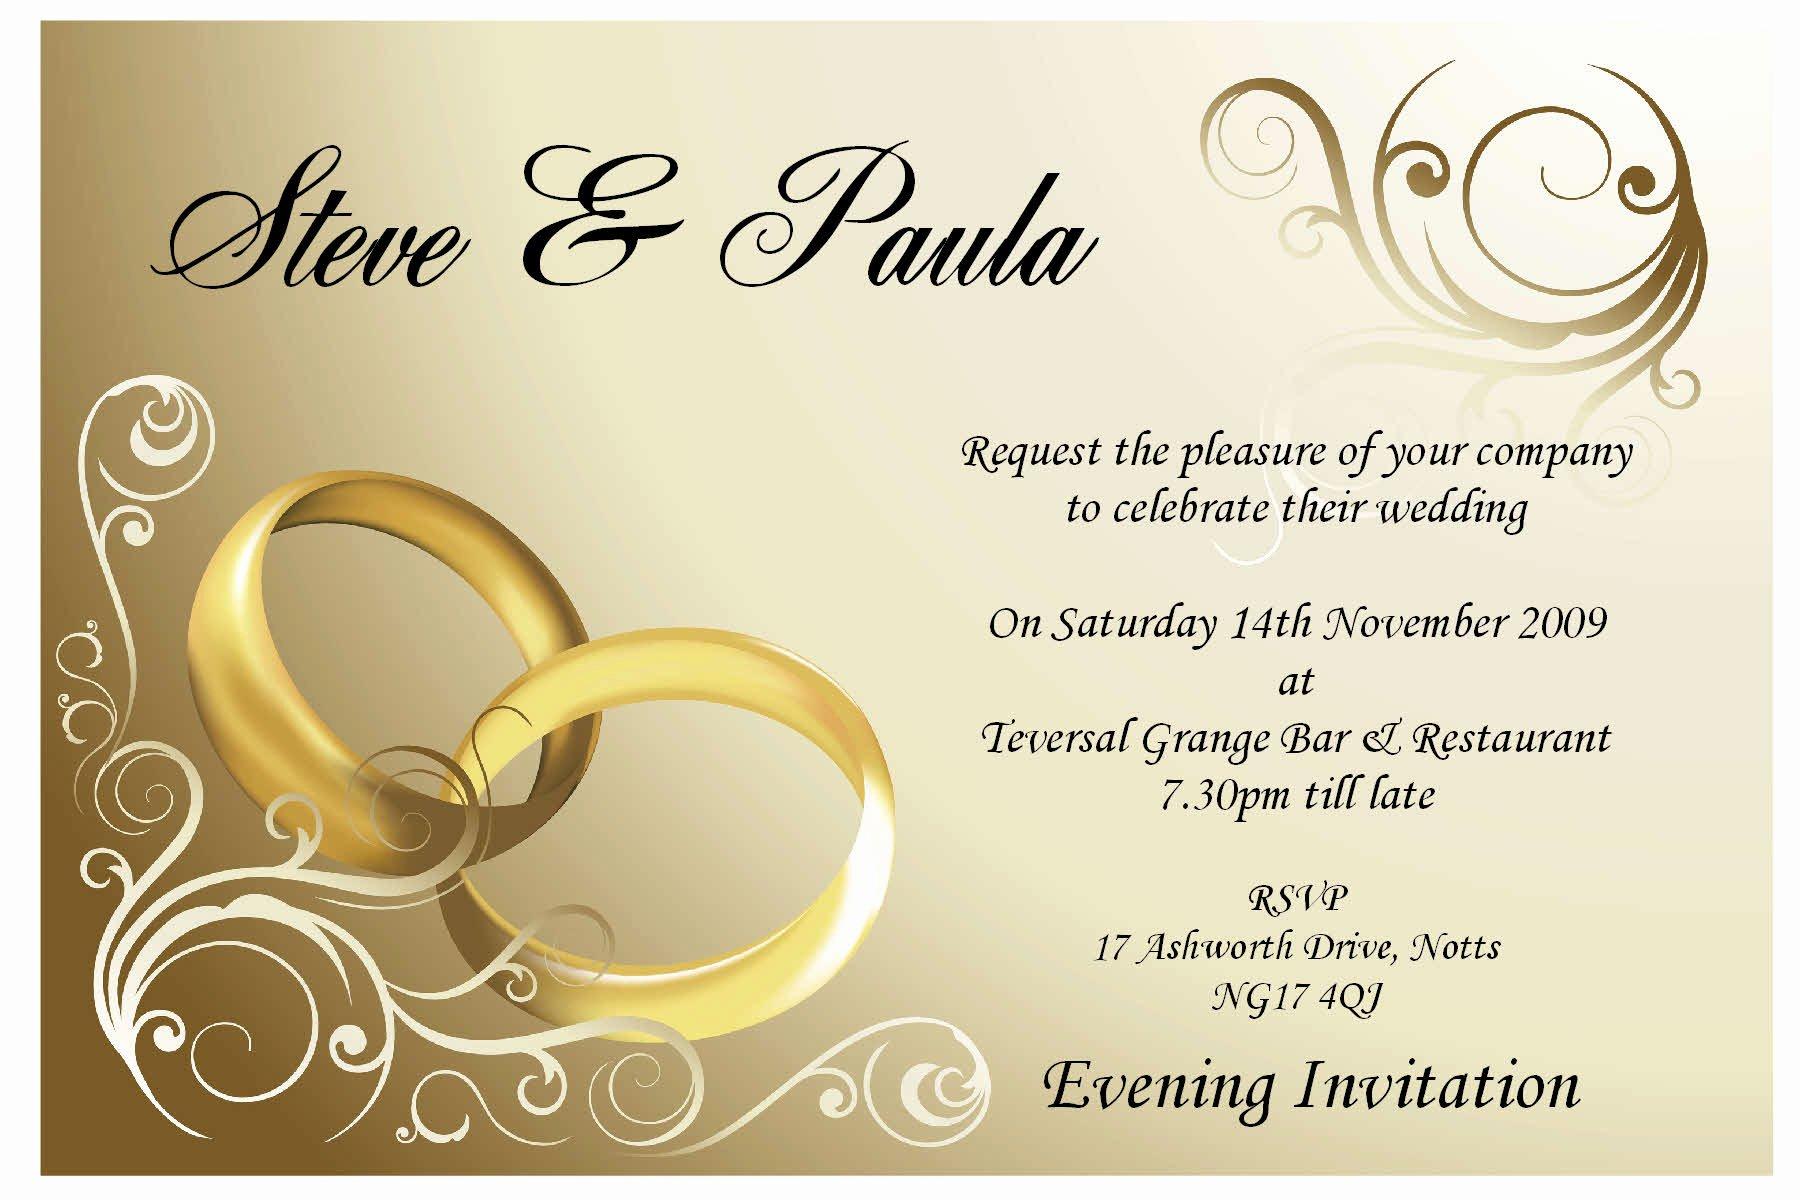 Postcard Wedding Invitations Template Luxury Simple Ideas Wedding Invitation Card Template Couple Ring